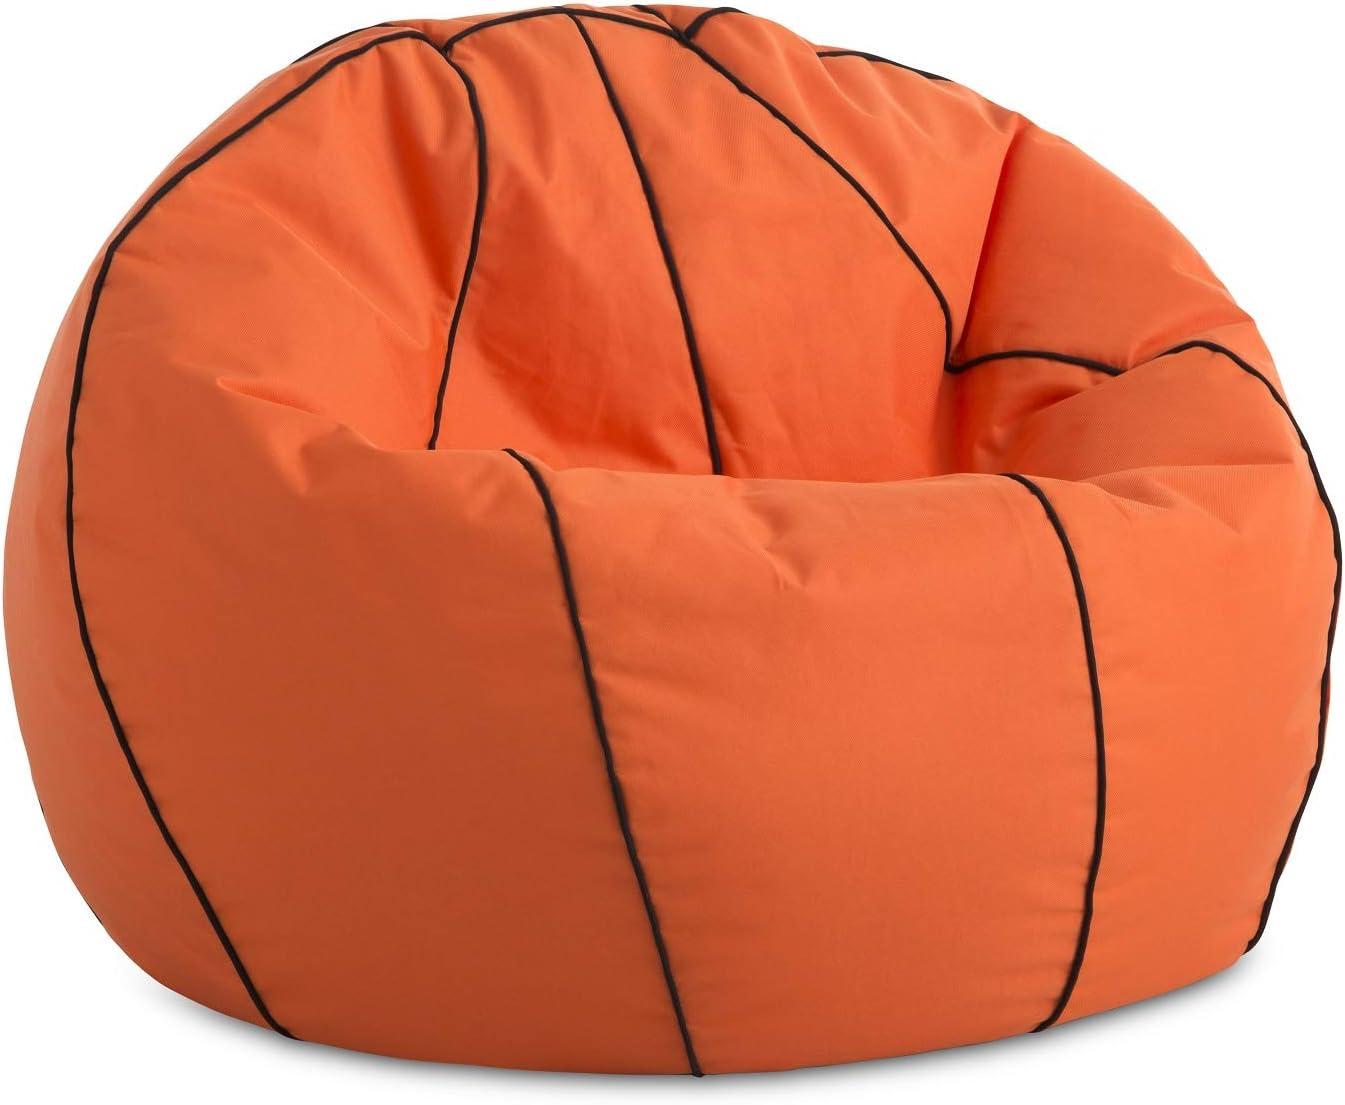 Textilhome - Balón PUF de Futbol Pelota de Puff, 90cm Diametro ...